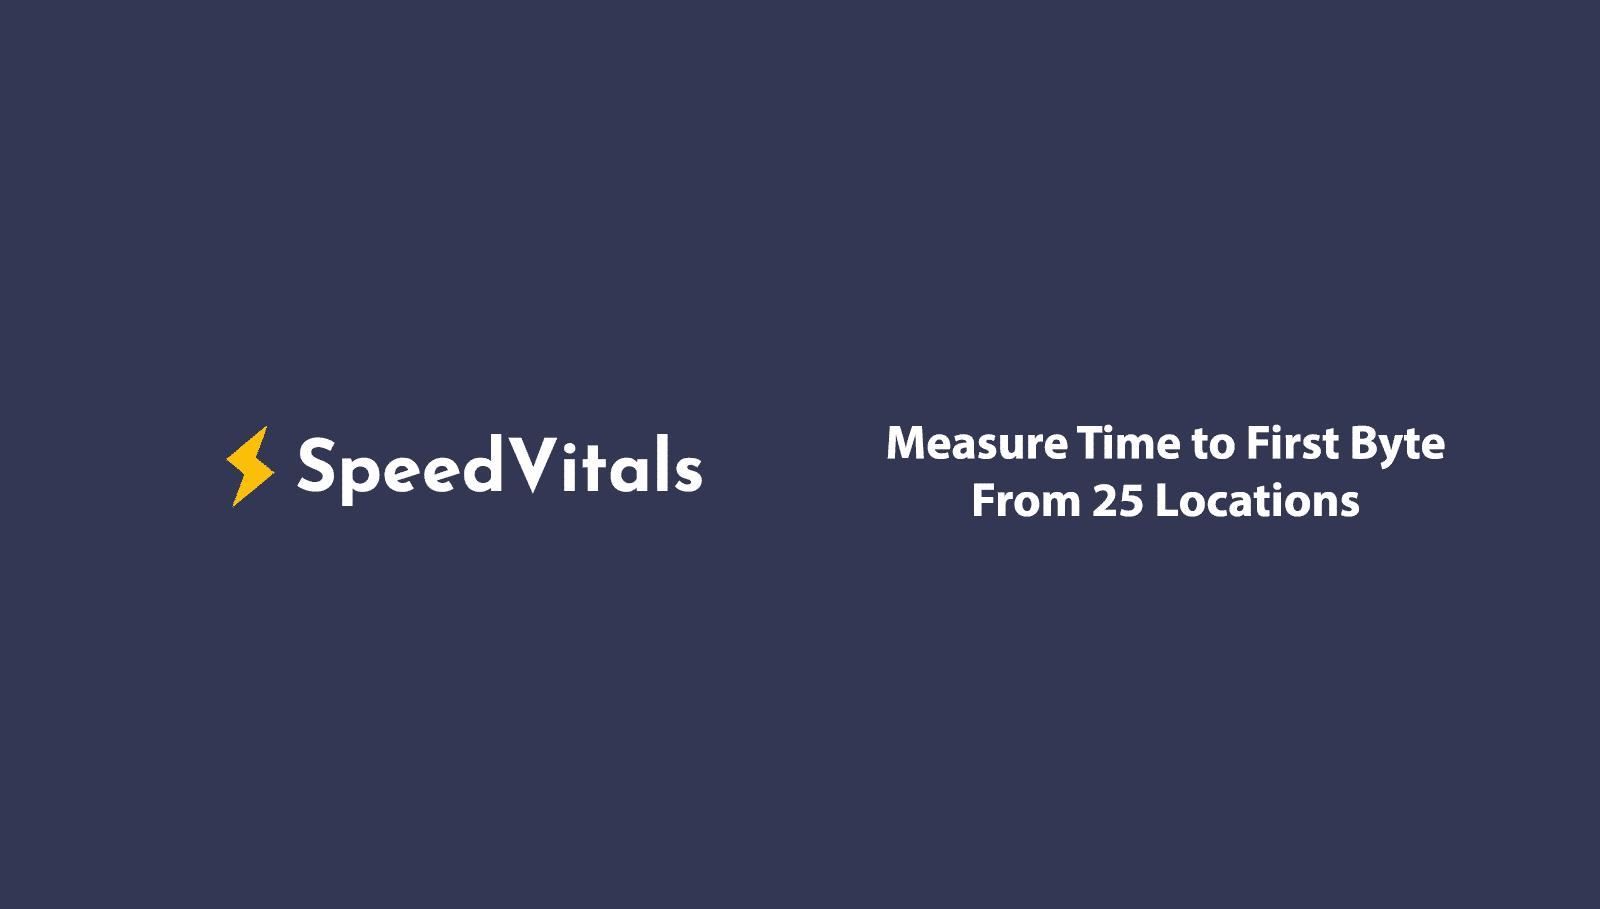 SpeedVitals TTFB Announcement